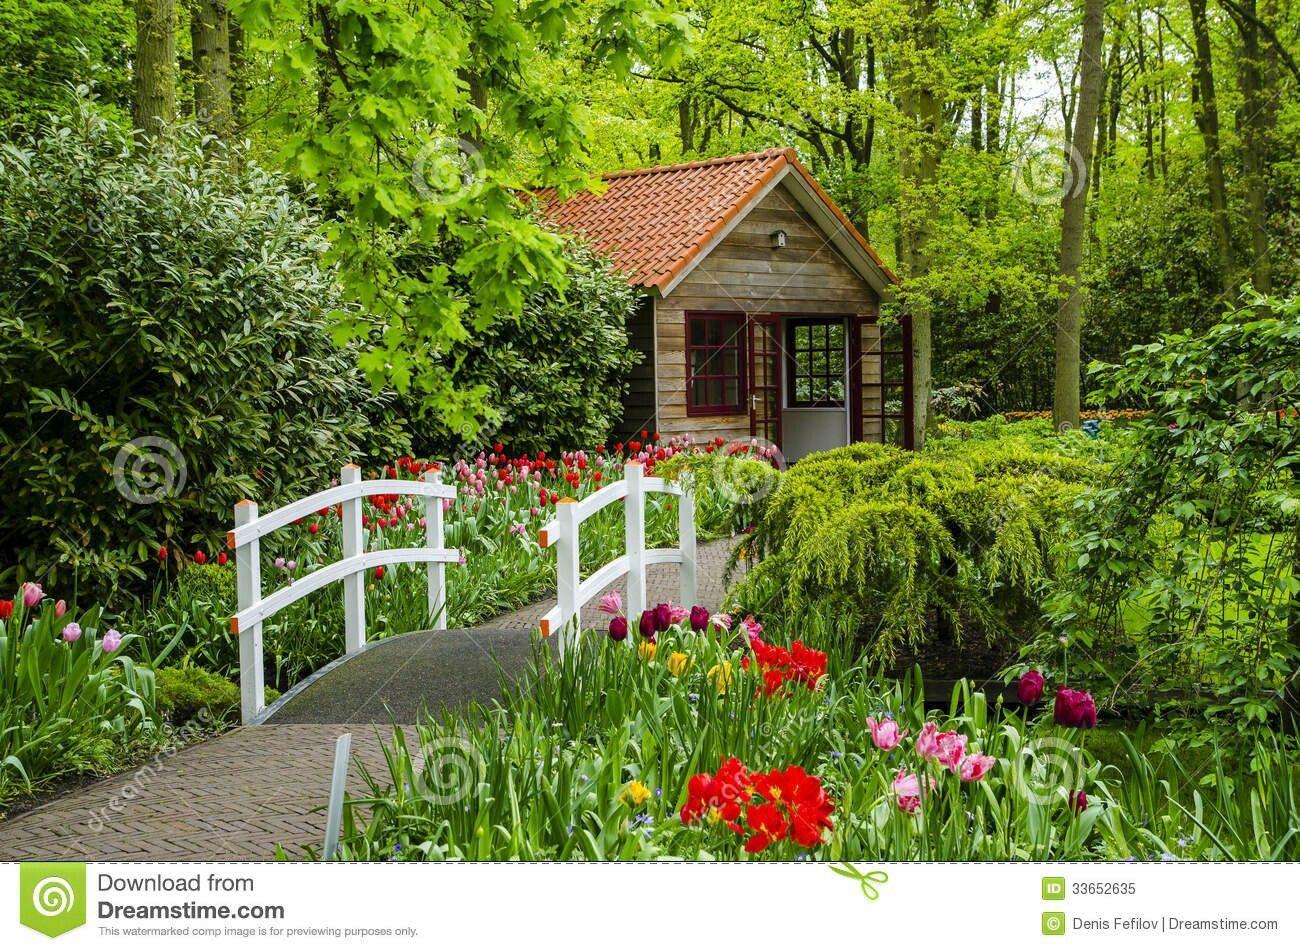 pin by gladys b on casas lindas y jardines hernosos pinterest